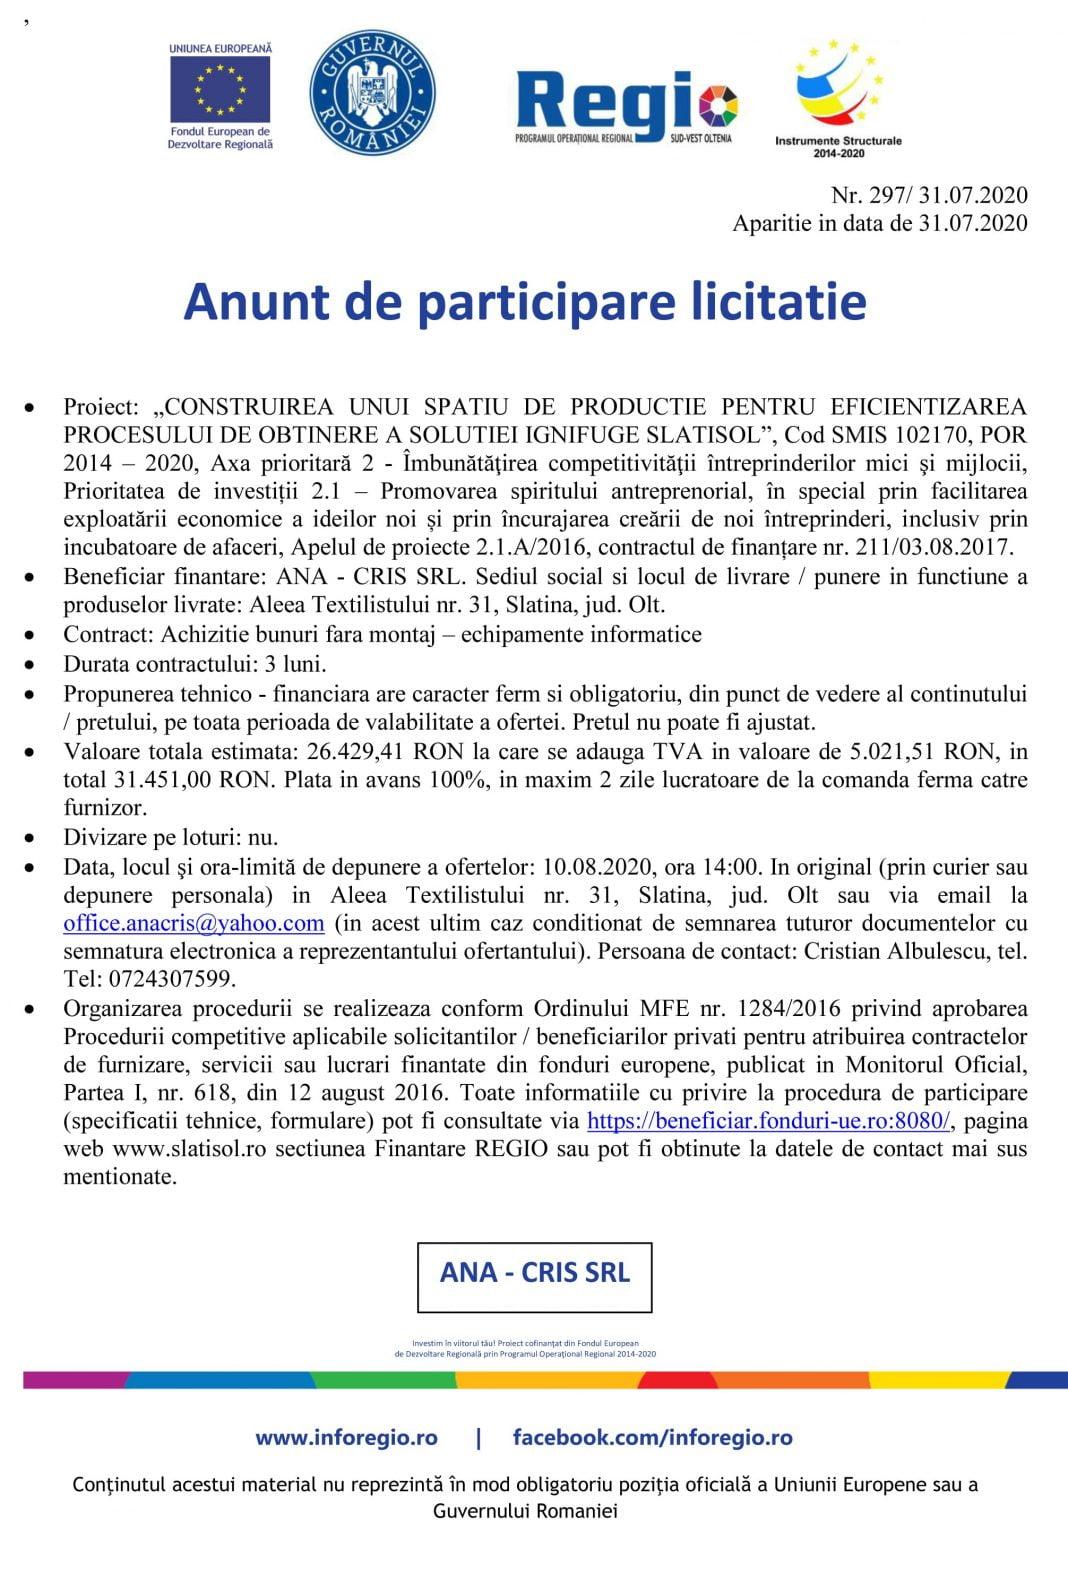 ANUNT Participare ziar ANA CRIS SRL